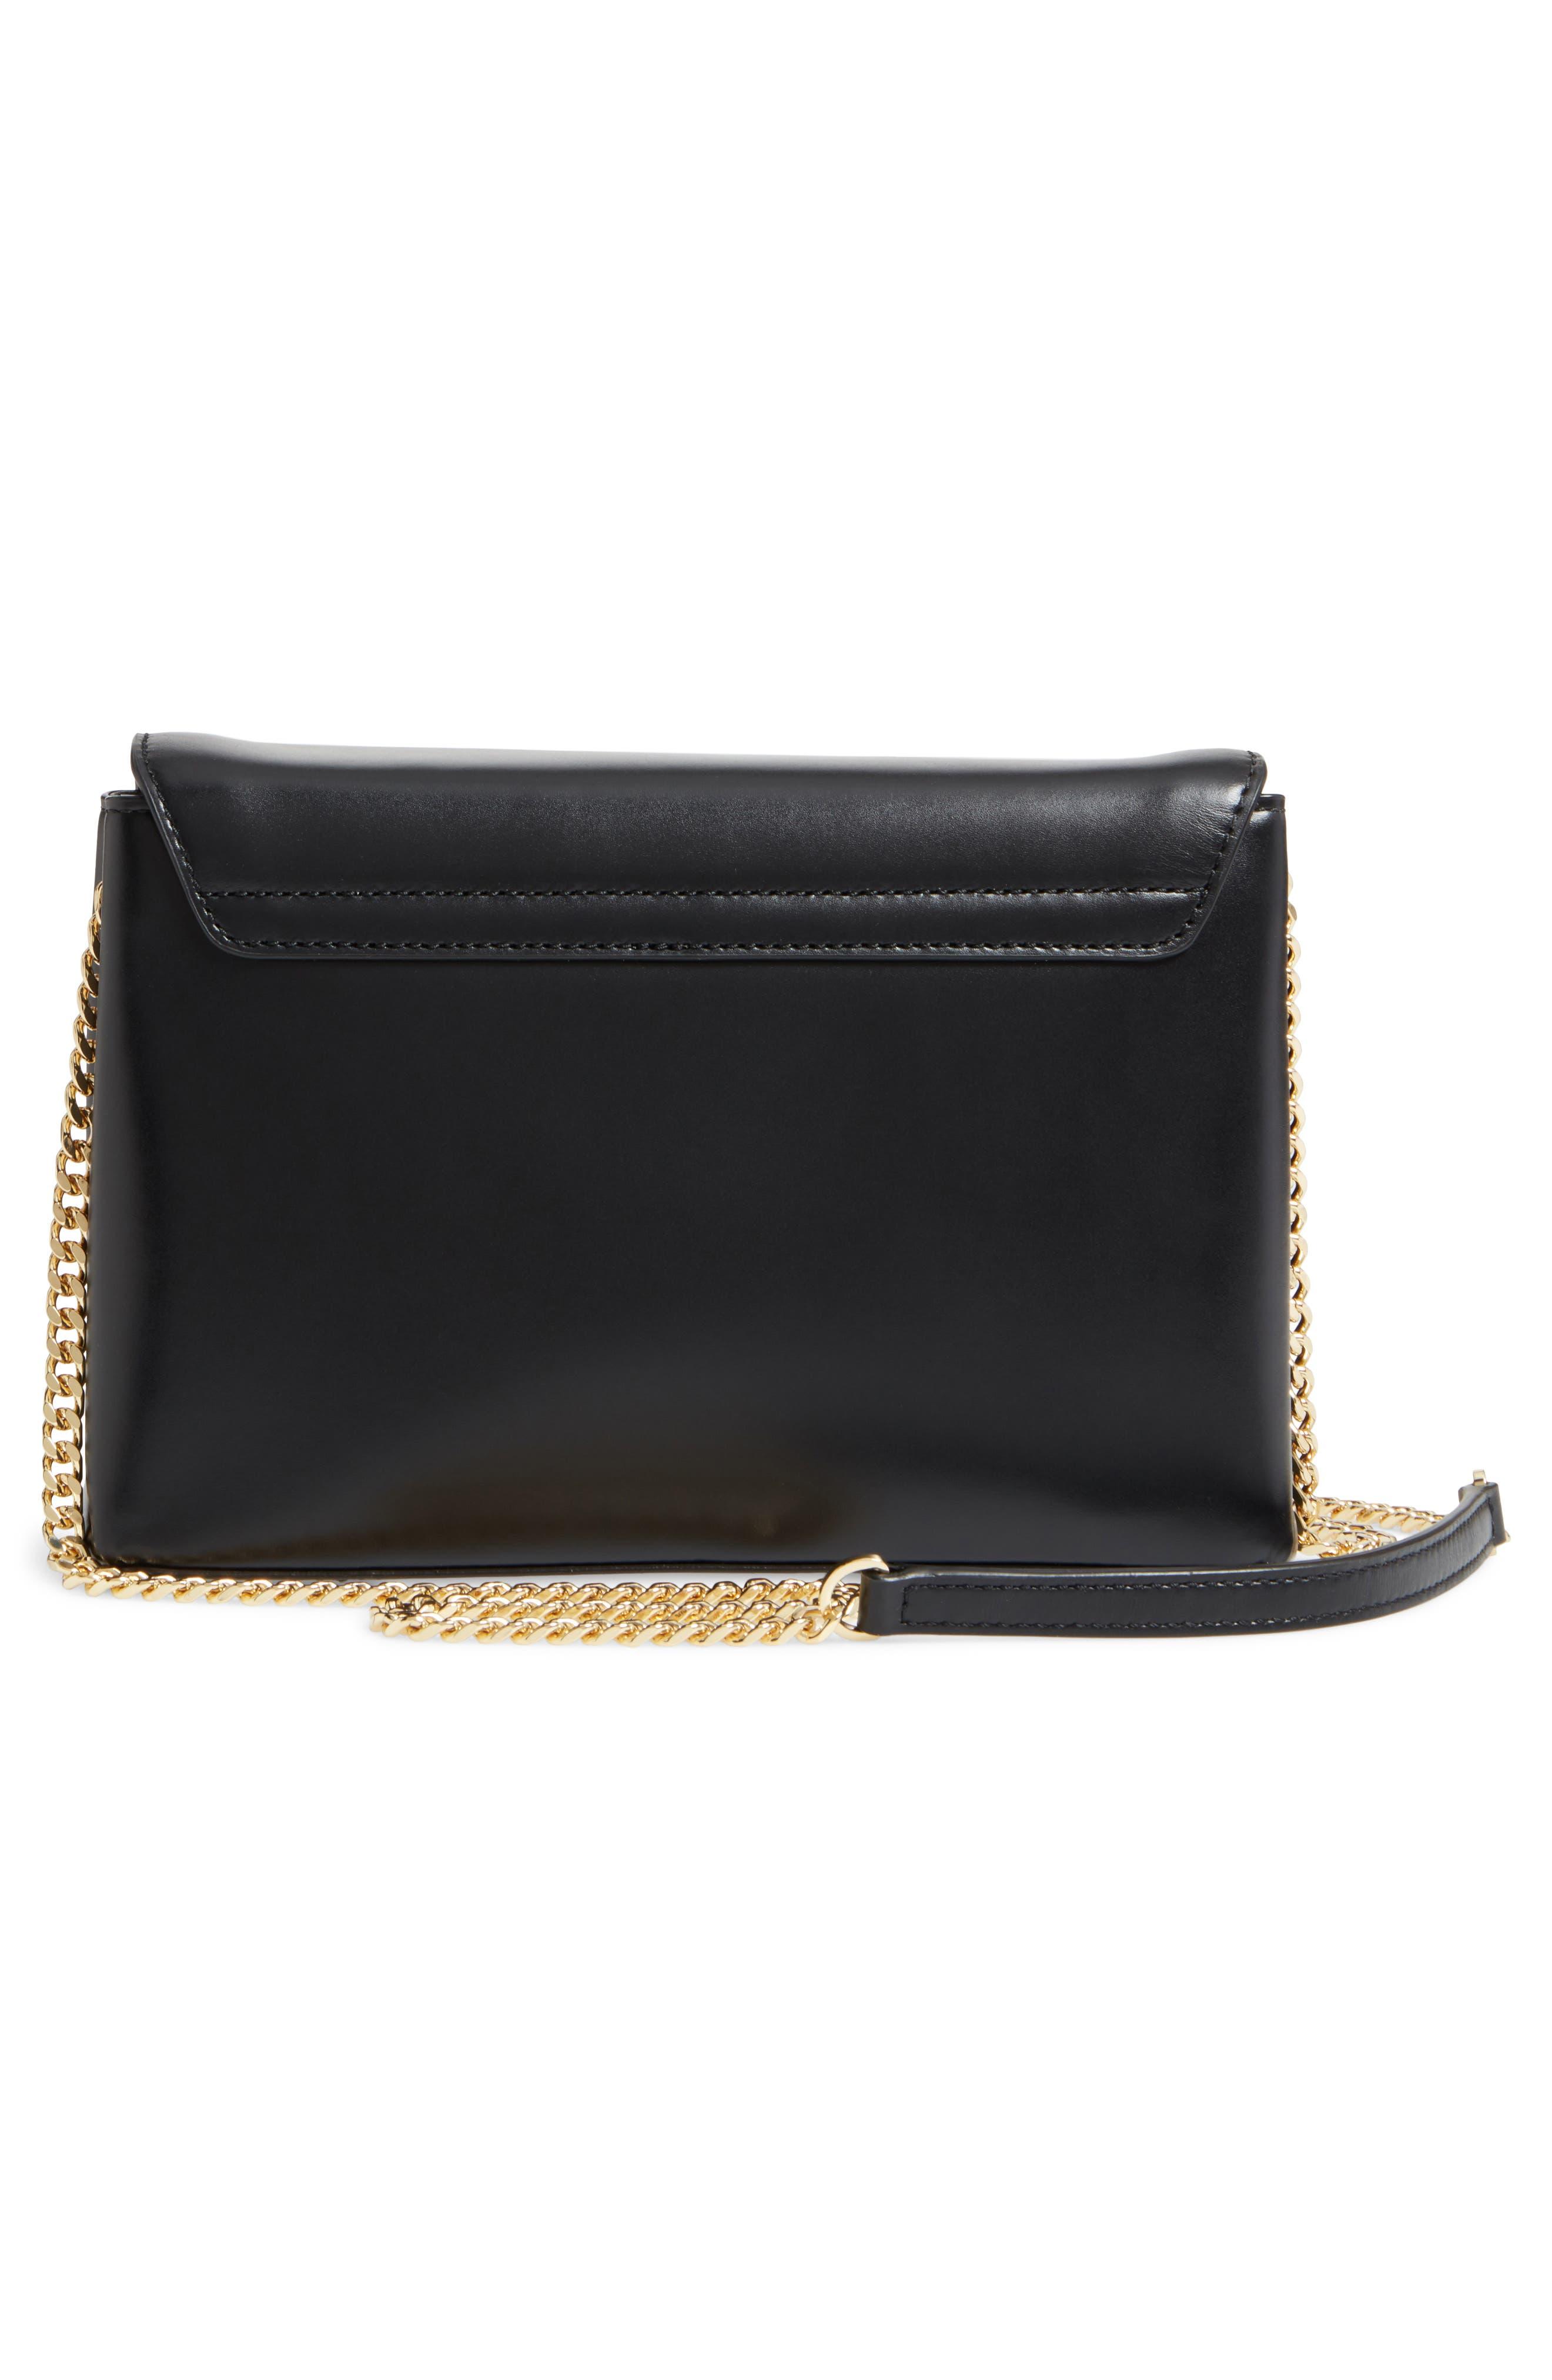 Saraa Leather Crossbody Bag,                             Alternate thumbnail 2, color,                             Black